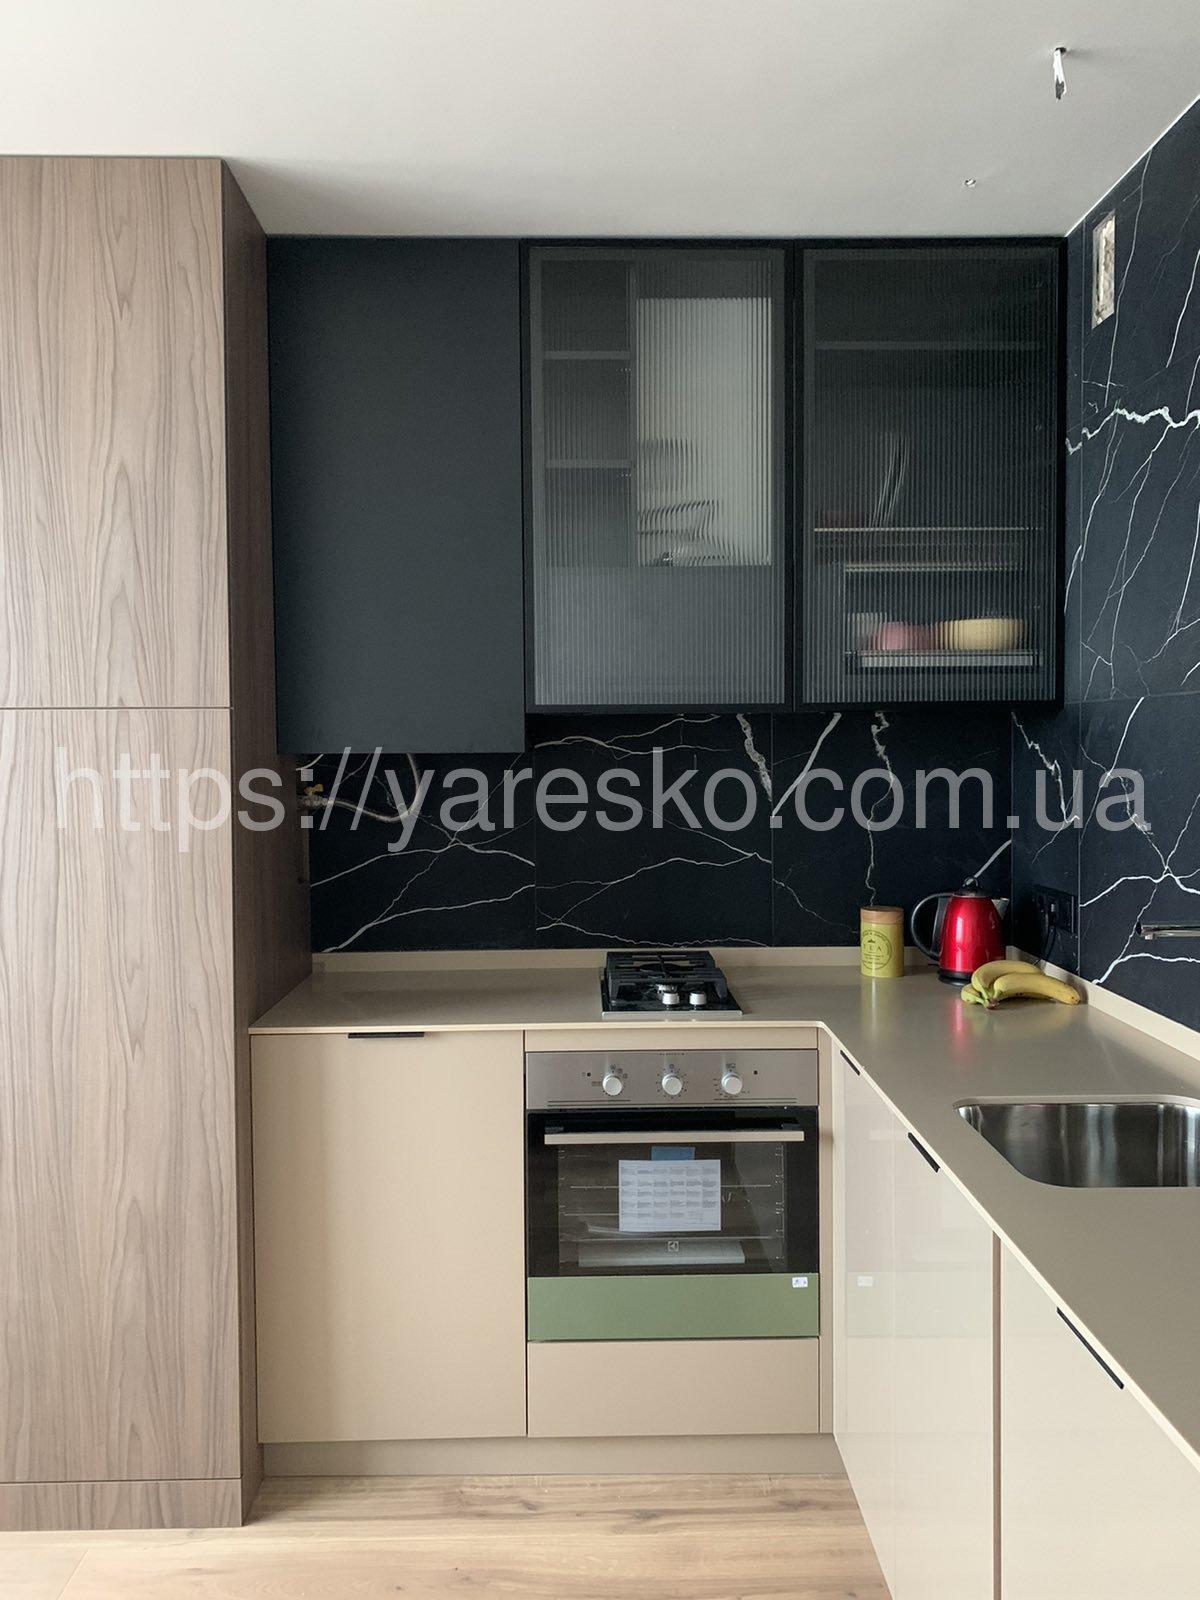 Кухня c AGT фасадами